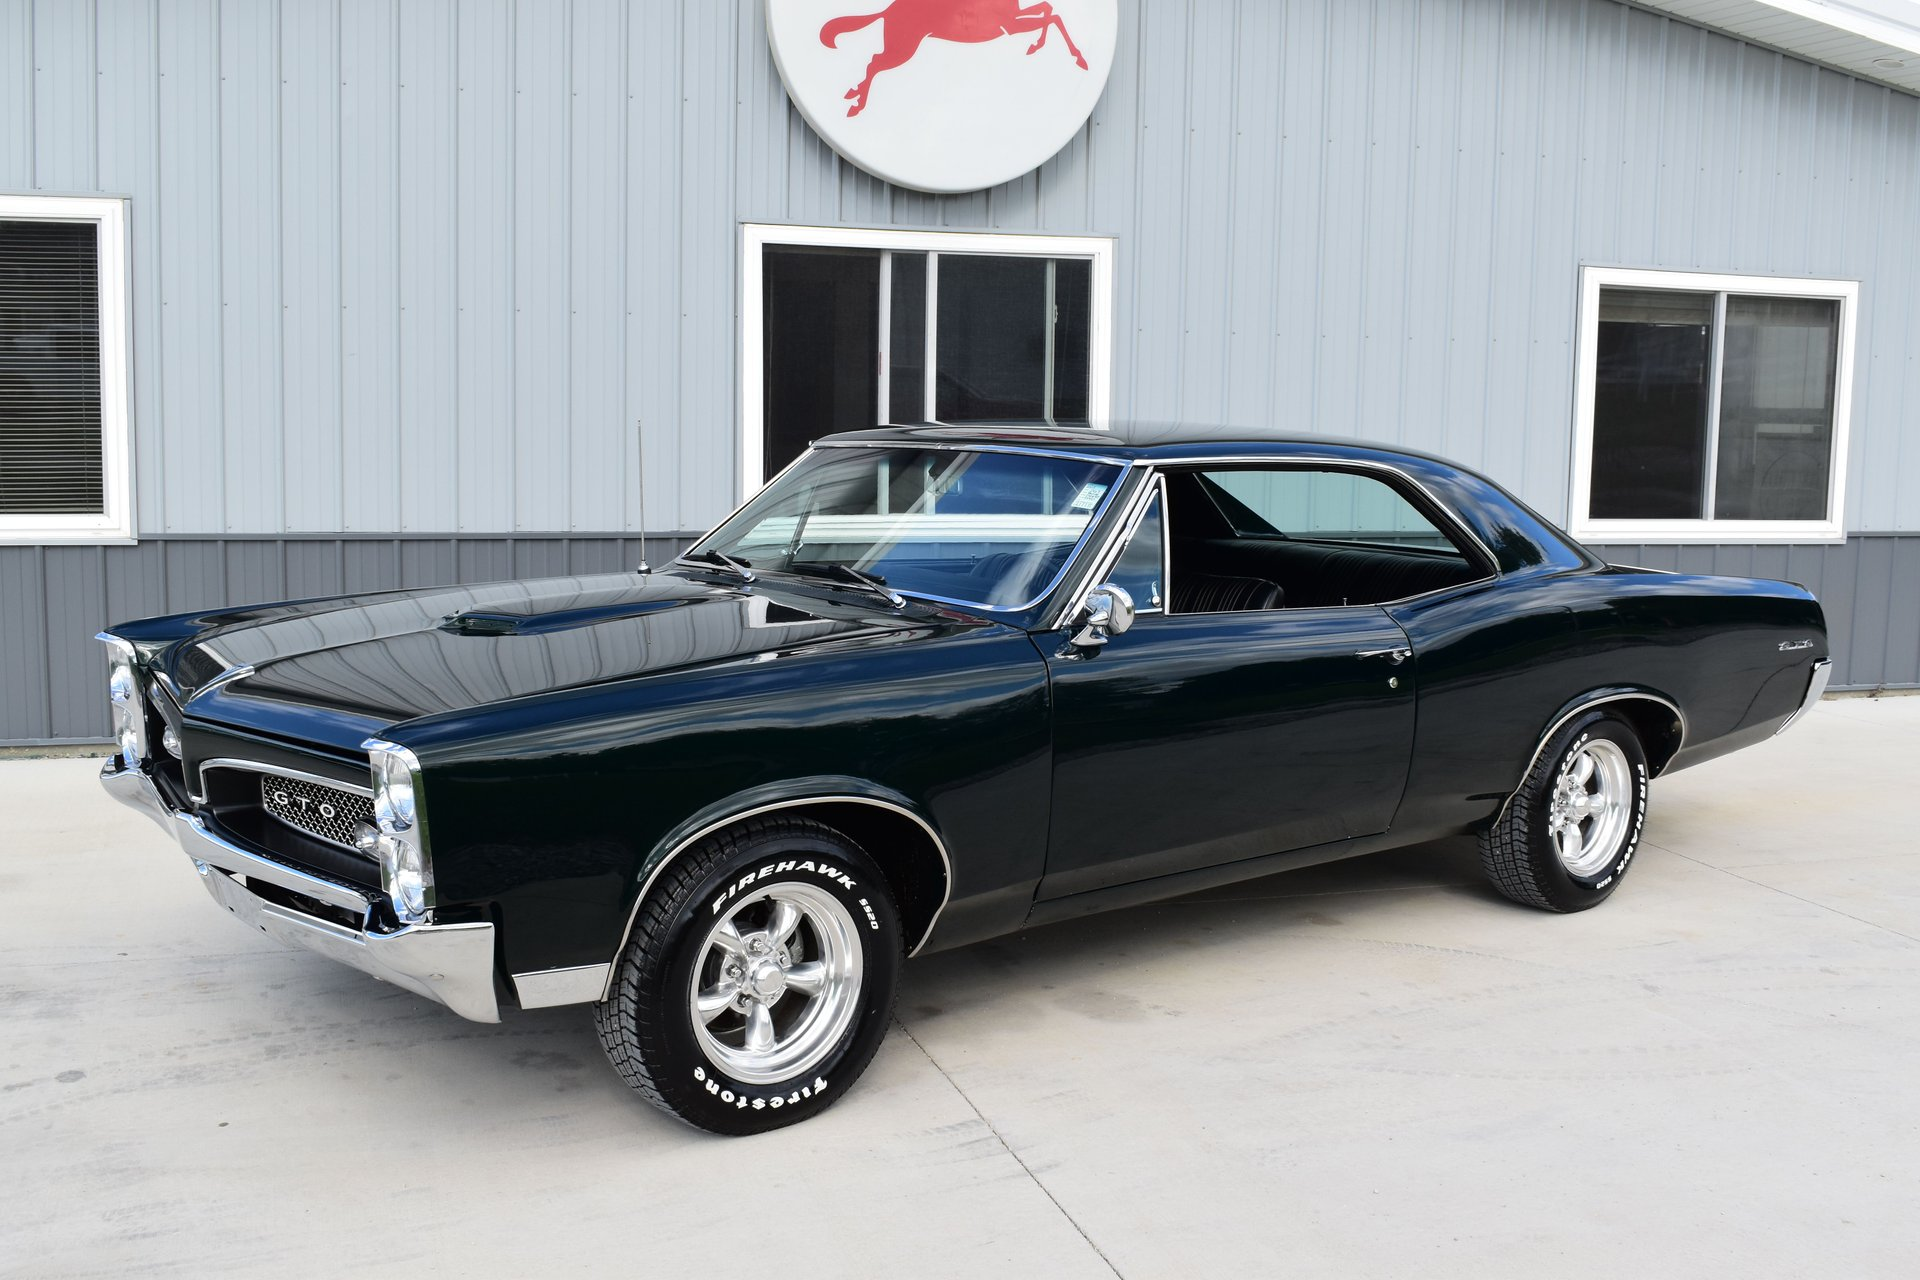 1967 Pontiac Tempest (GTO Tribute)